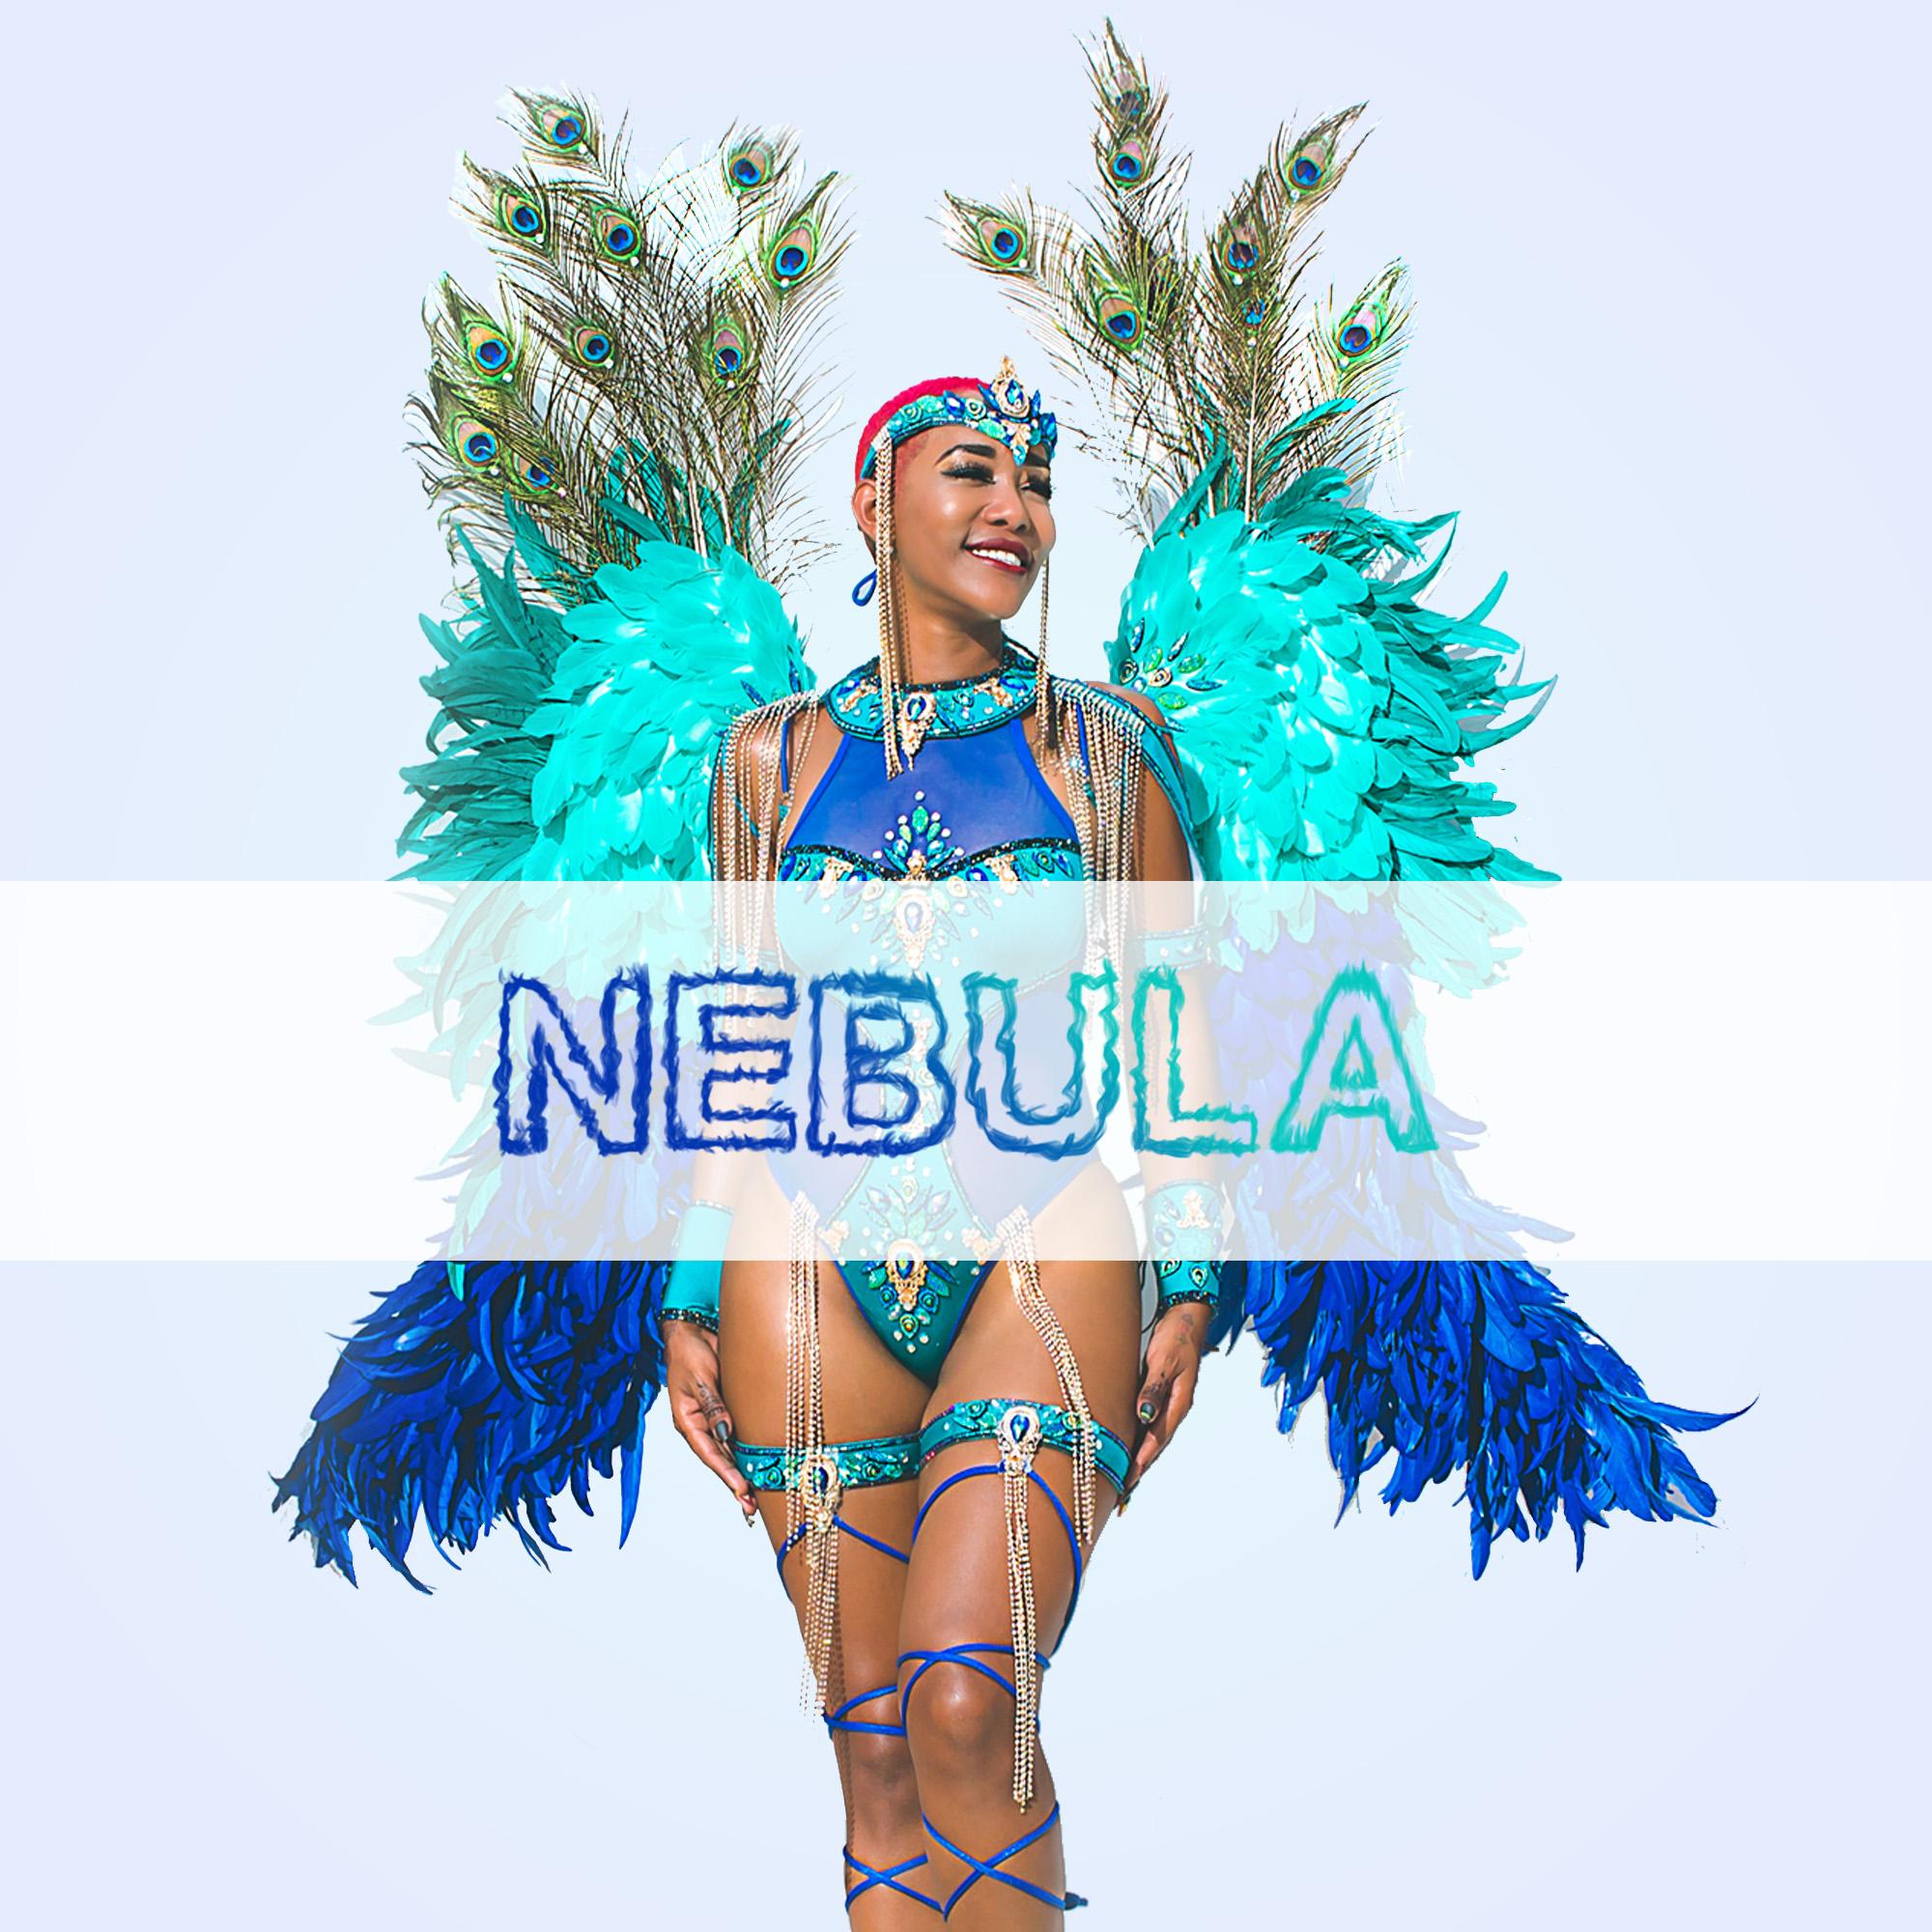 Copy of Nebula